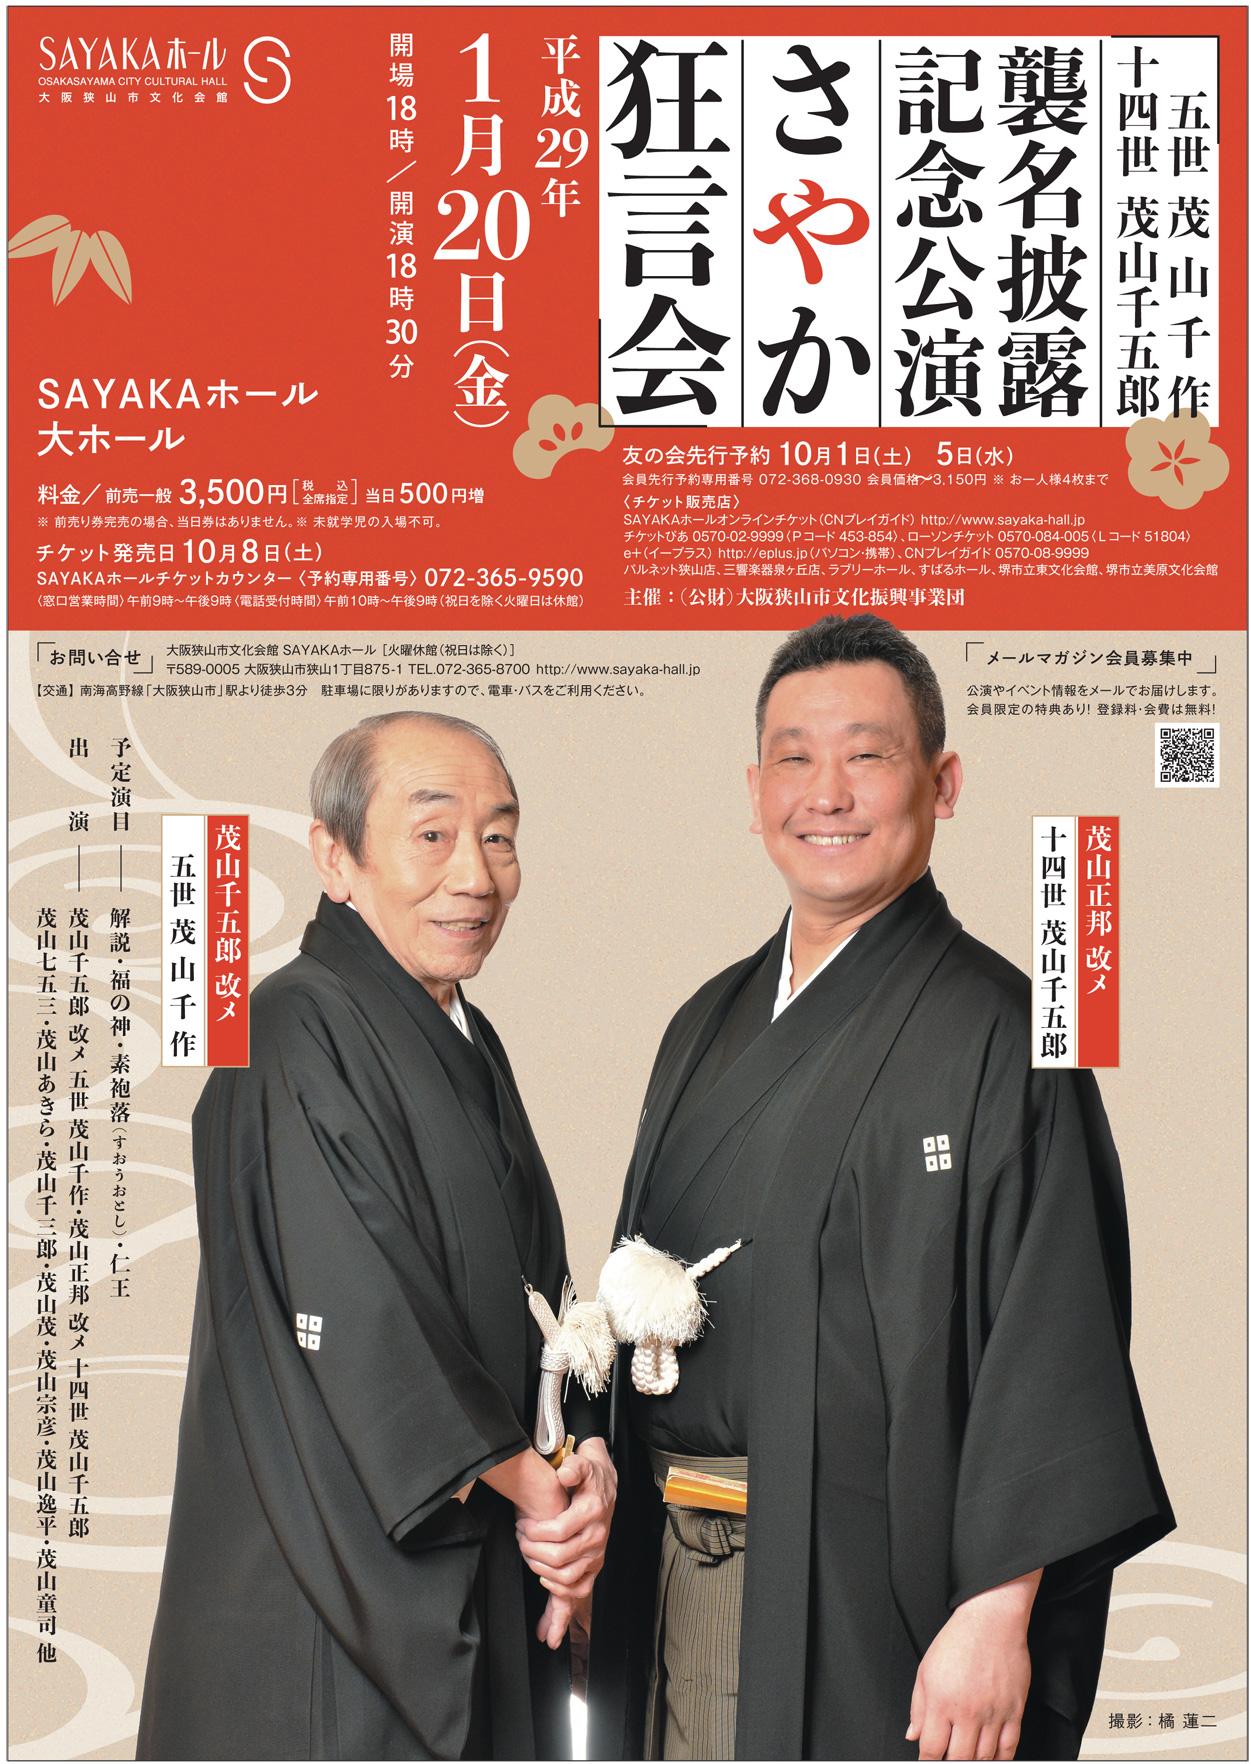 20170120sayaka_omote